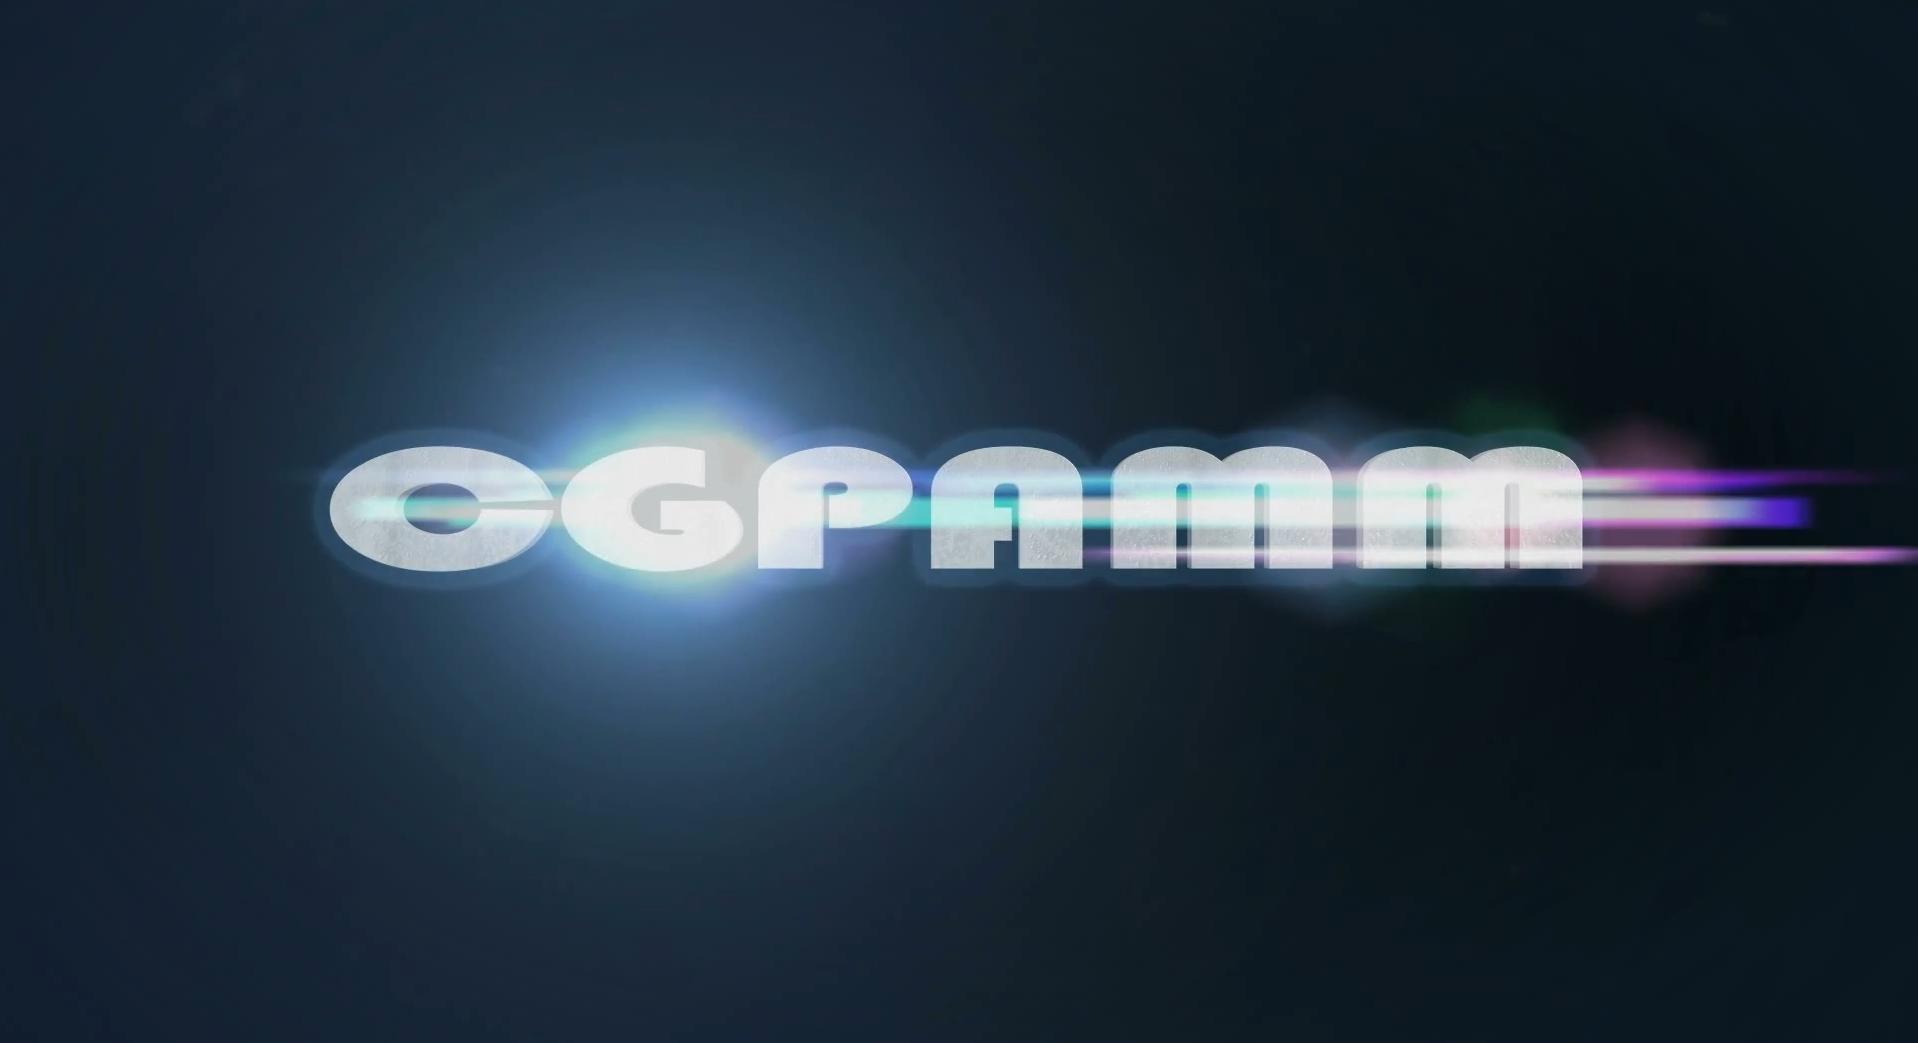 CGPAMM Game studio